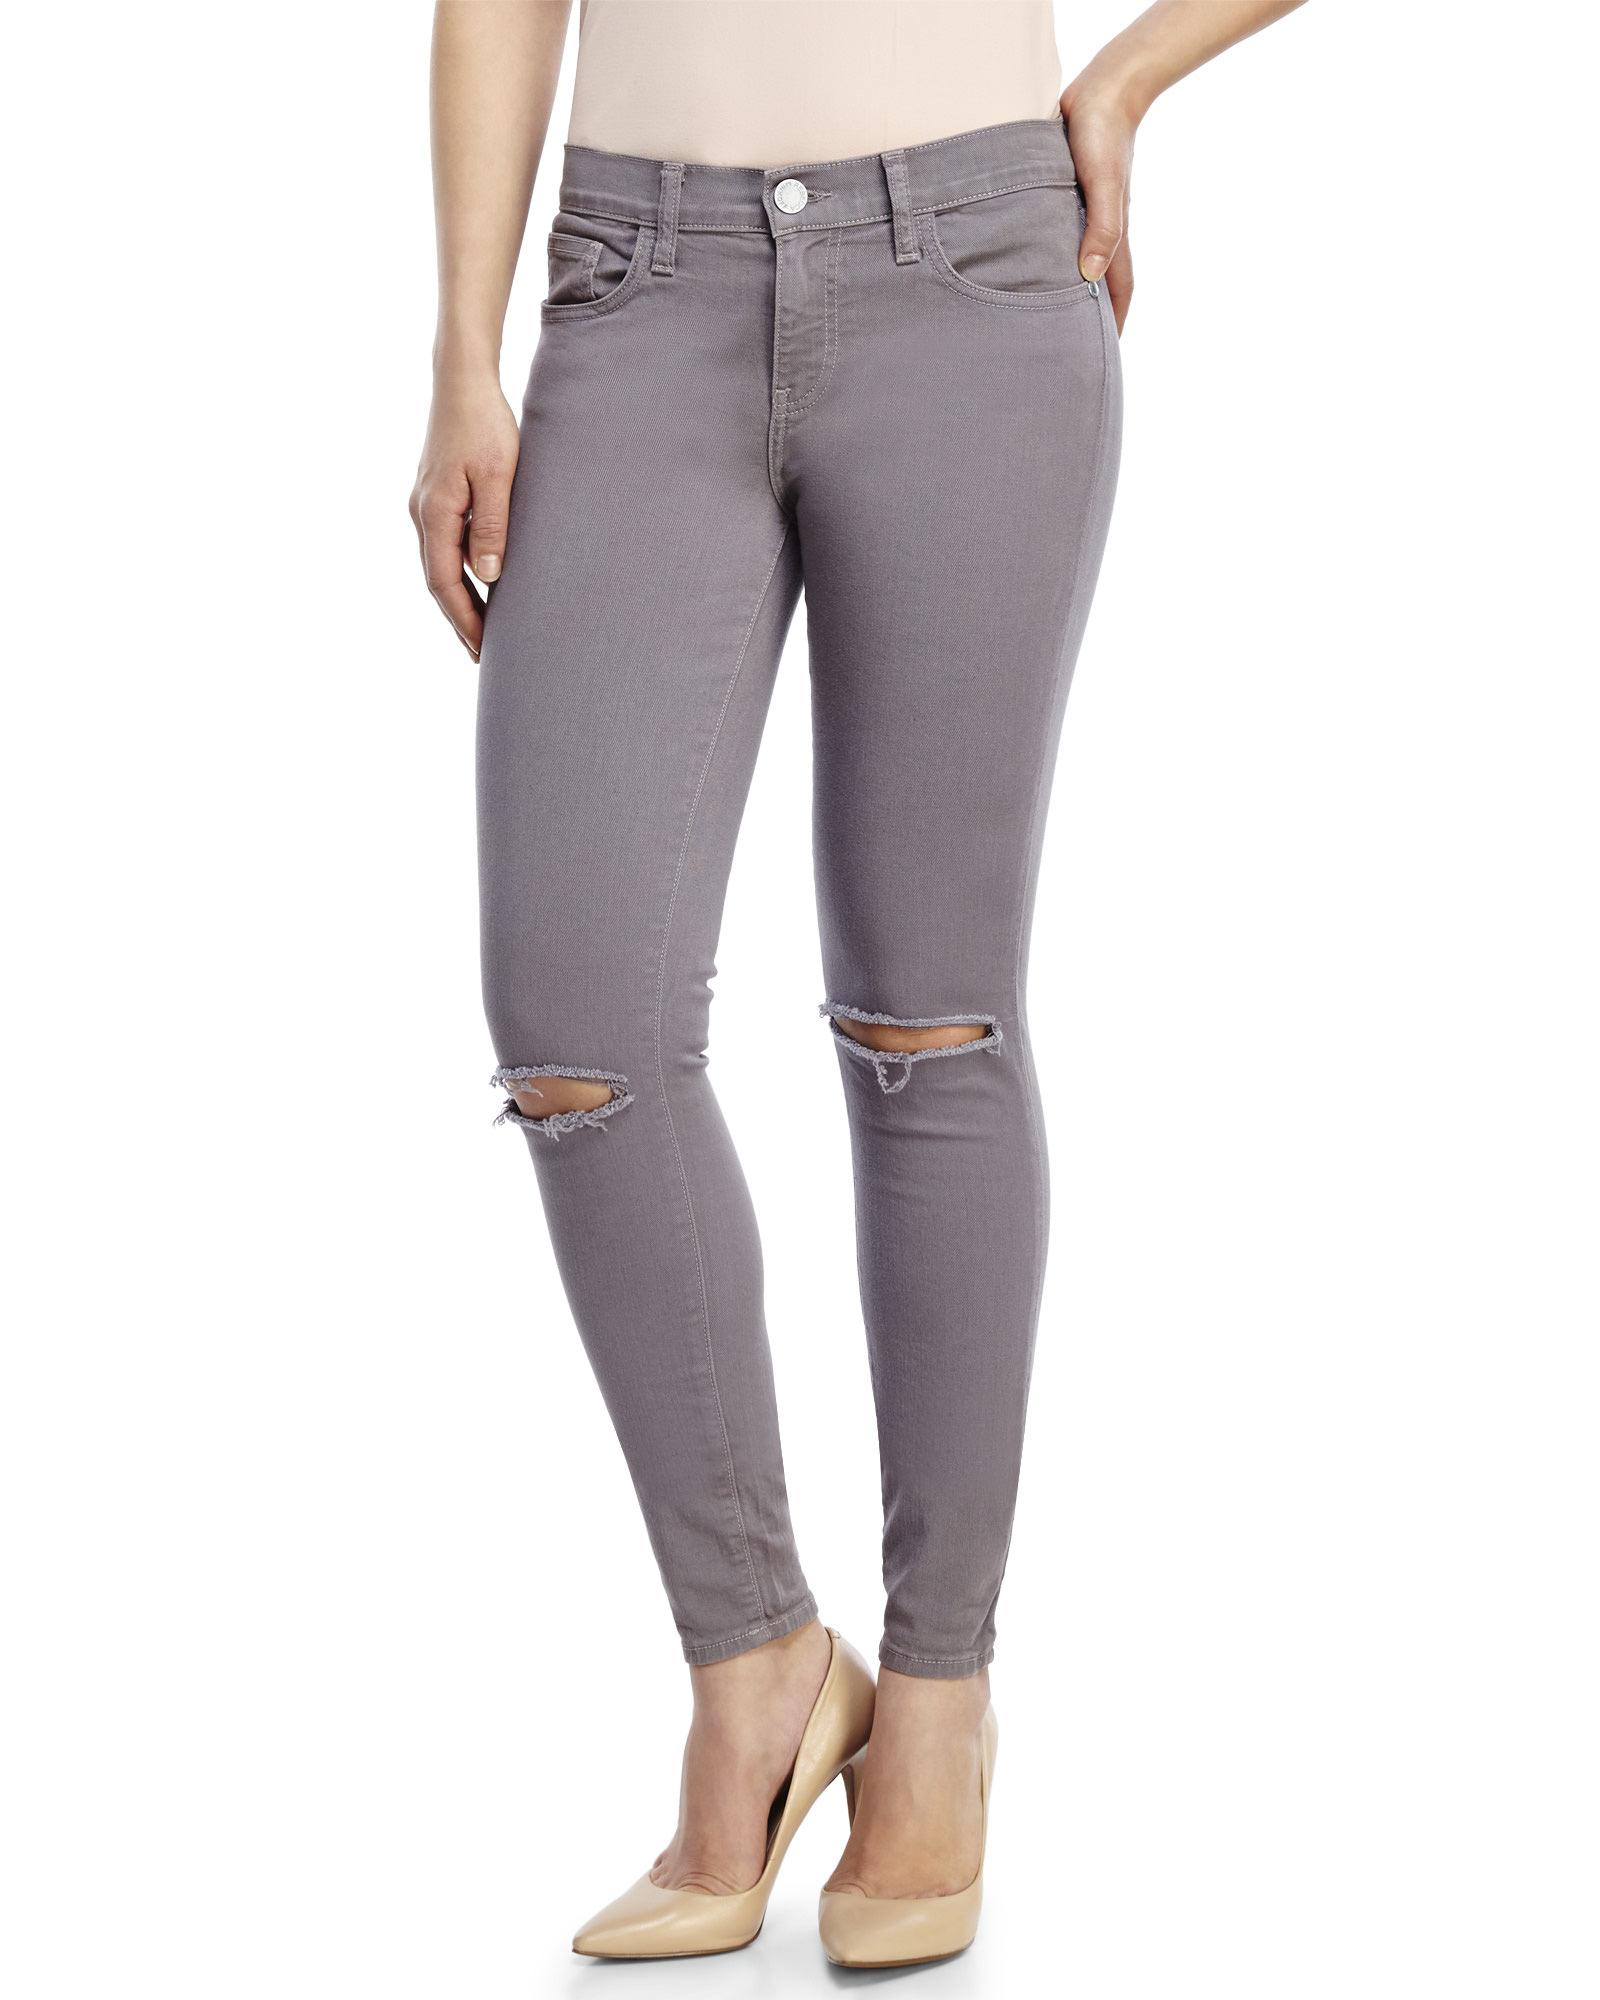 DENIM - Denim trousers Rebecca Minkoff EkUYYhXRd